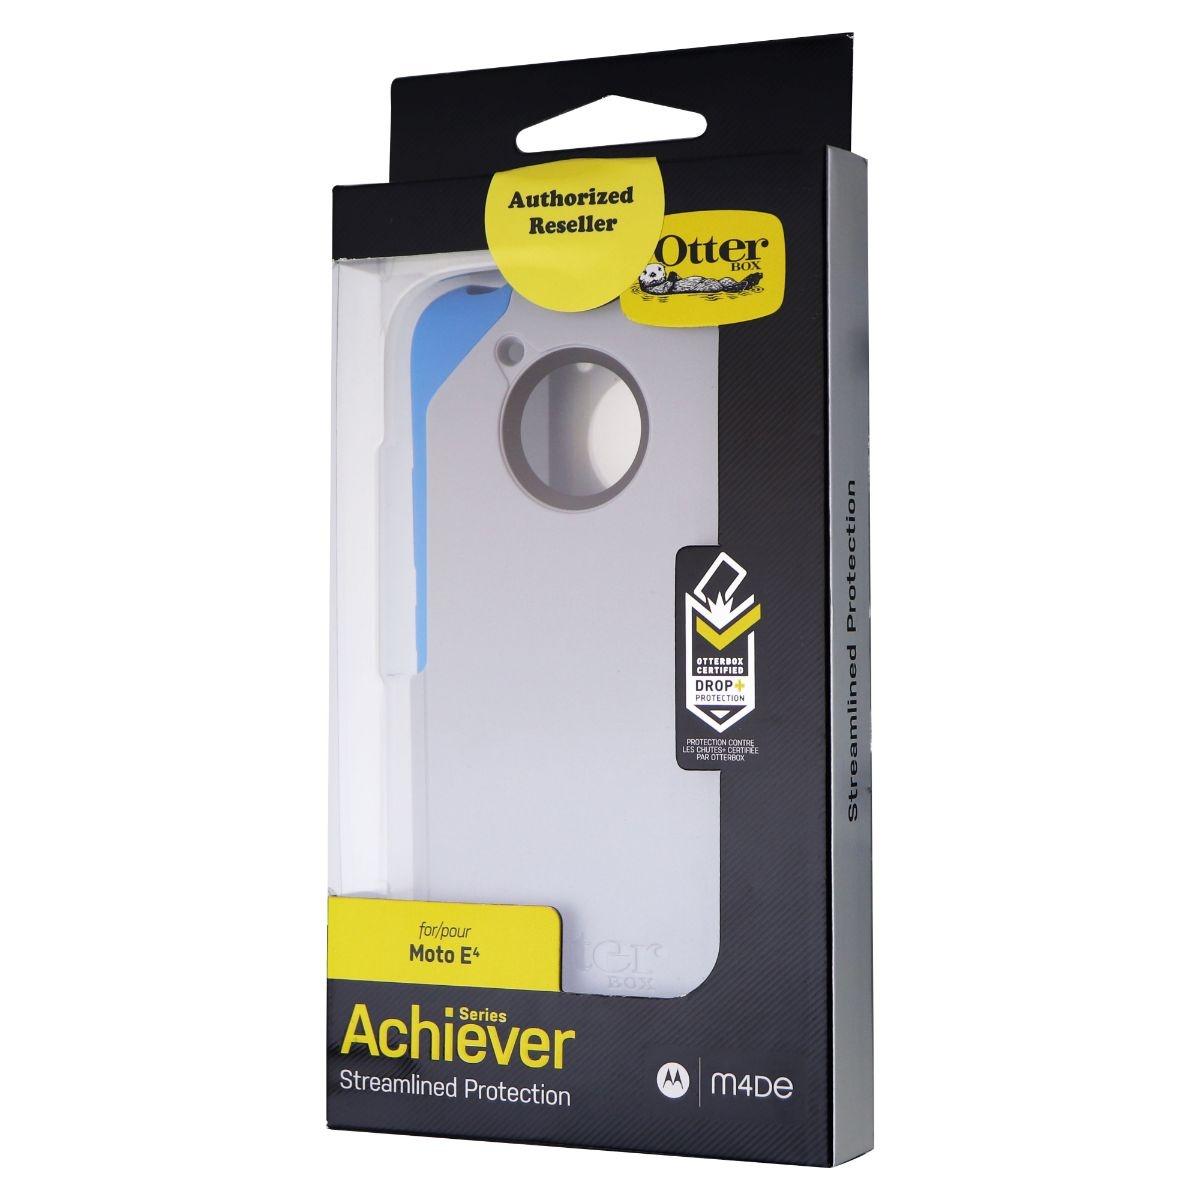 OtterBox Achiever Series Case for Motorola Moto E4 - Water Stone (Gray/Blue)